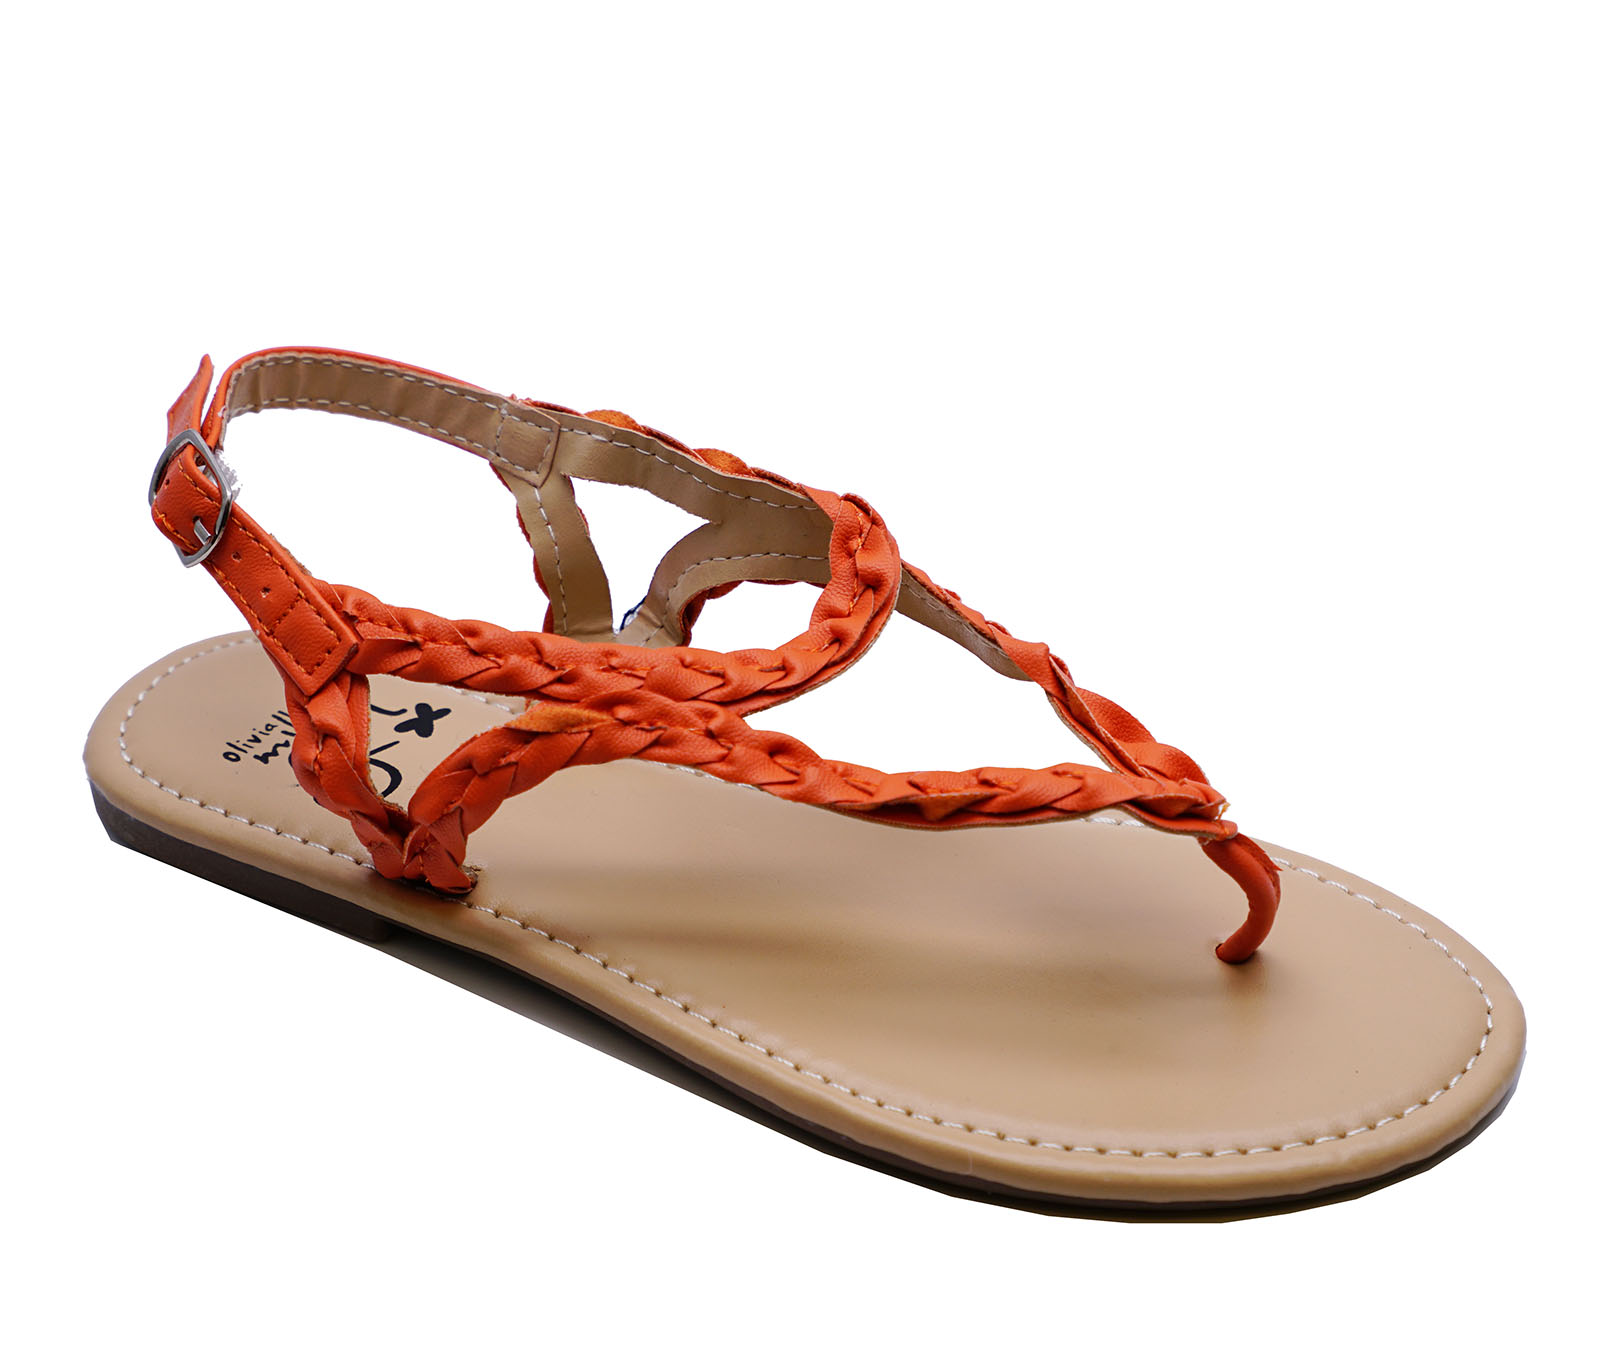 nina-infantil-naranja-con-Tira-Sandalias-Estilo-Gladiador-Zapatos-de-verano